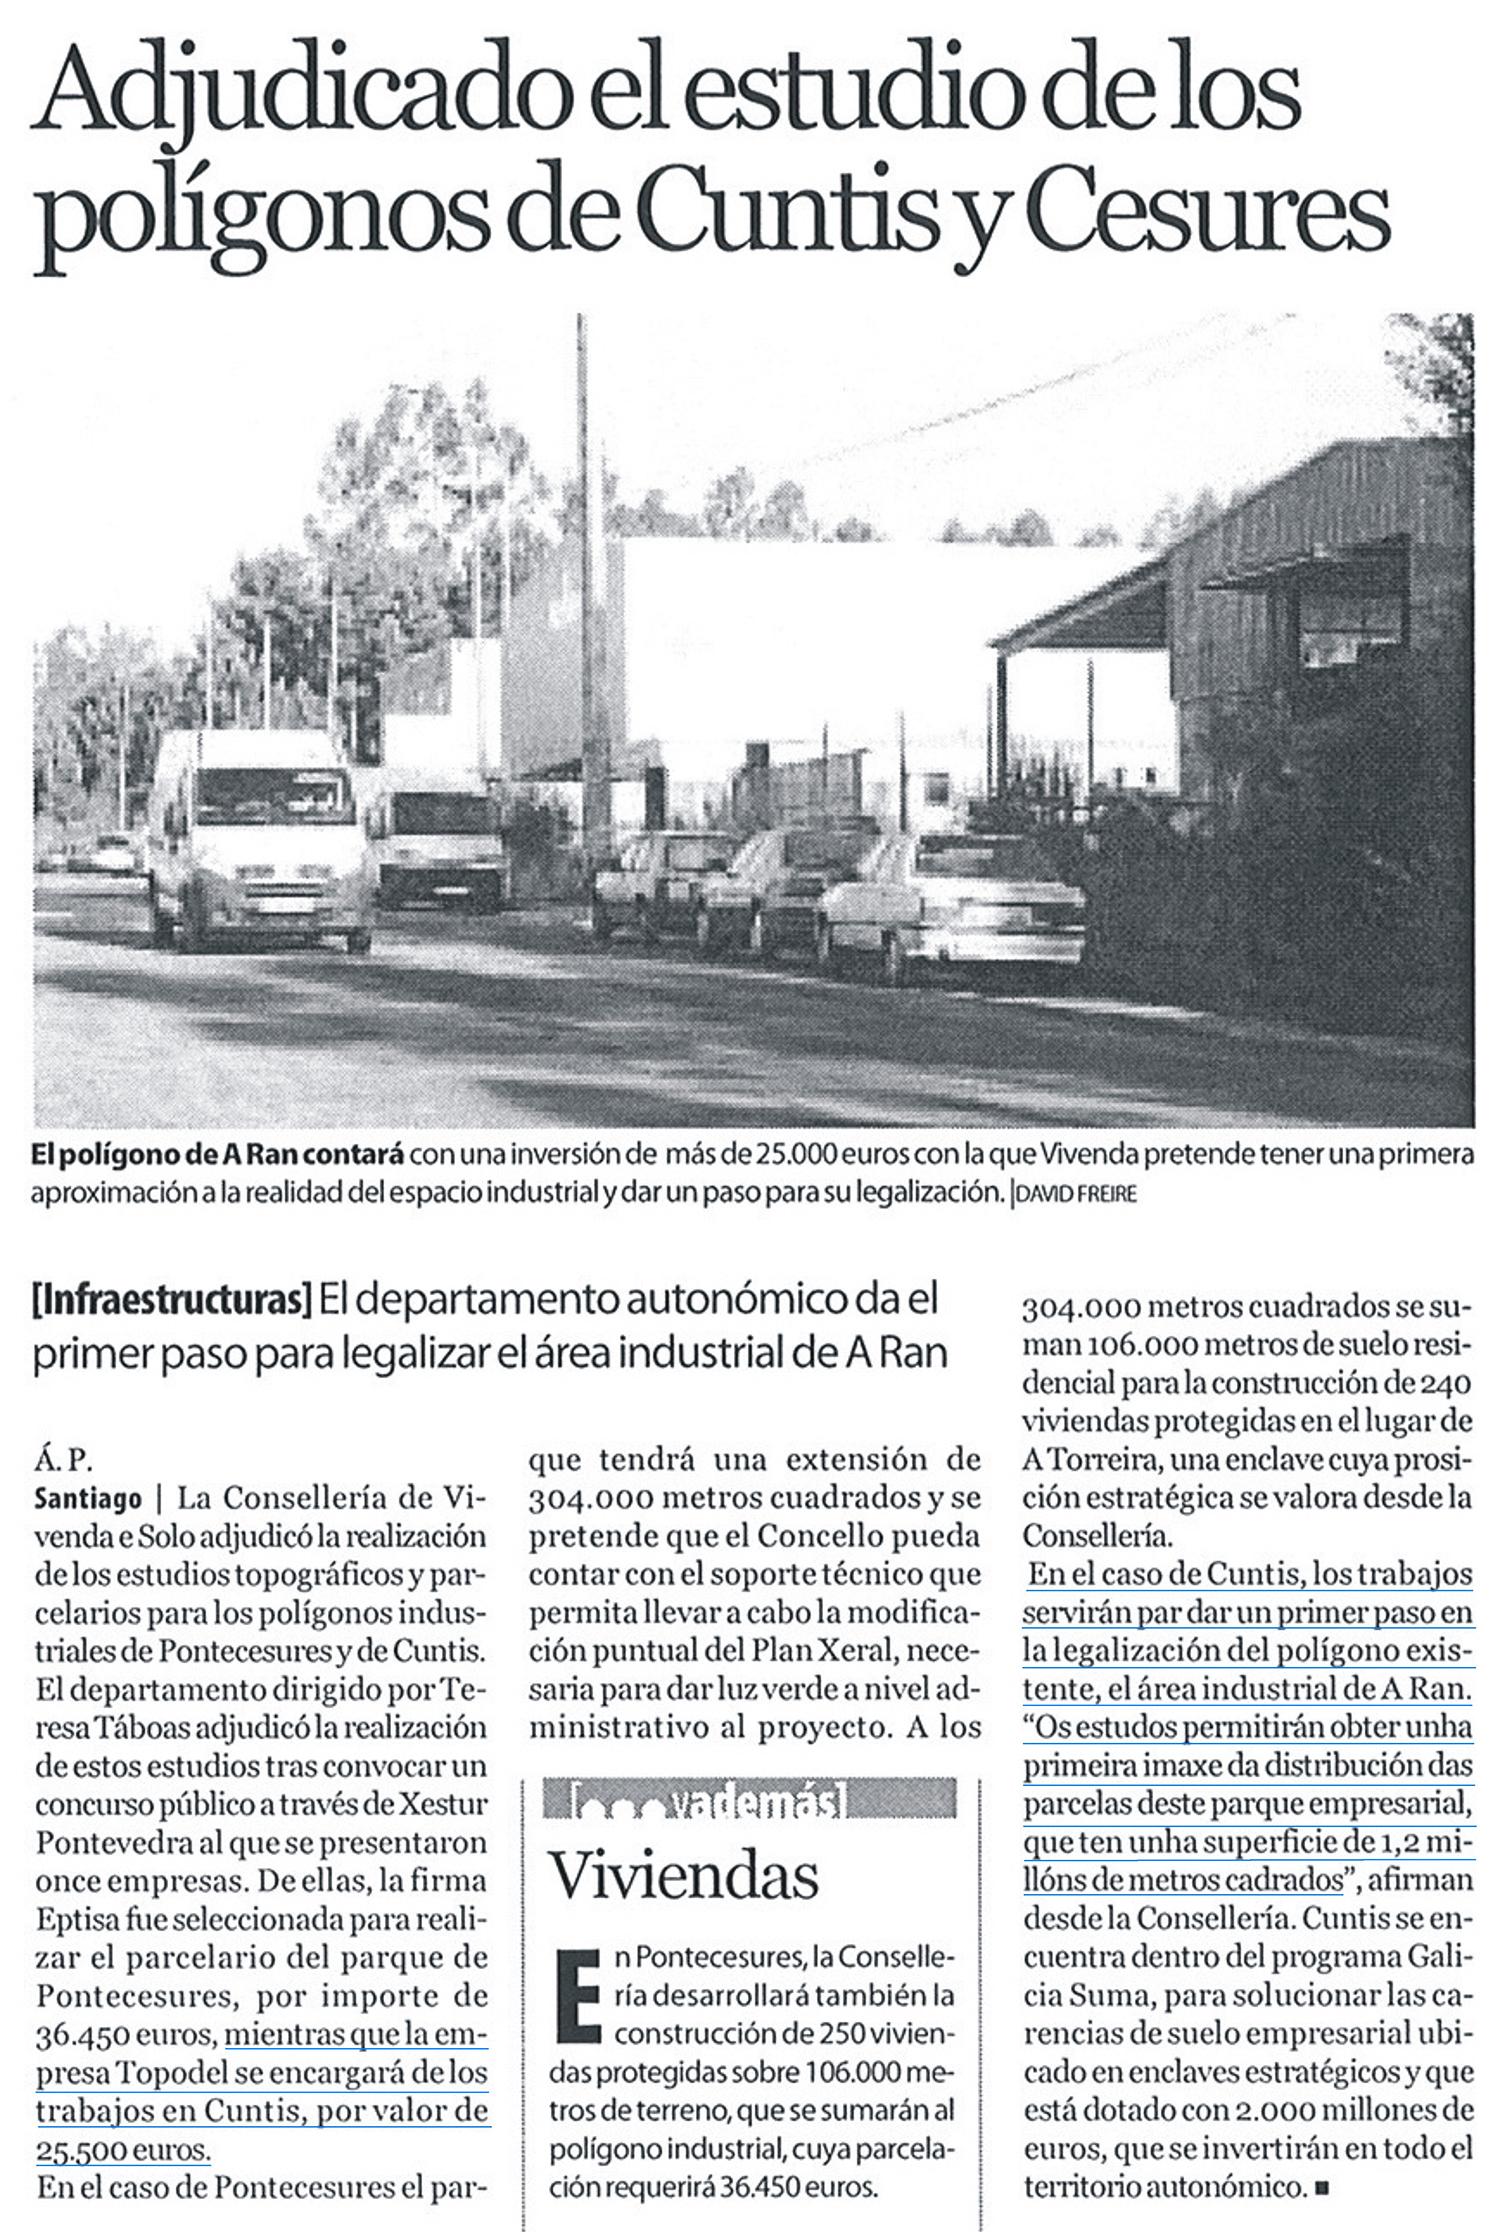 01-08-2006  Diario de Pontevedra